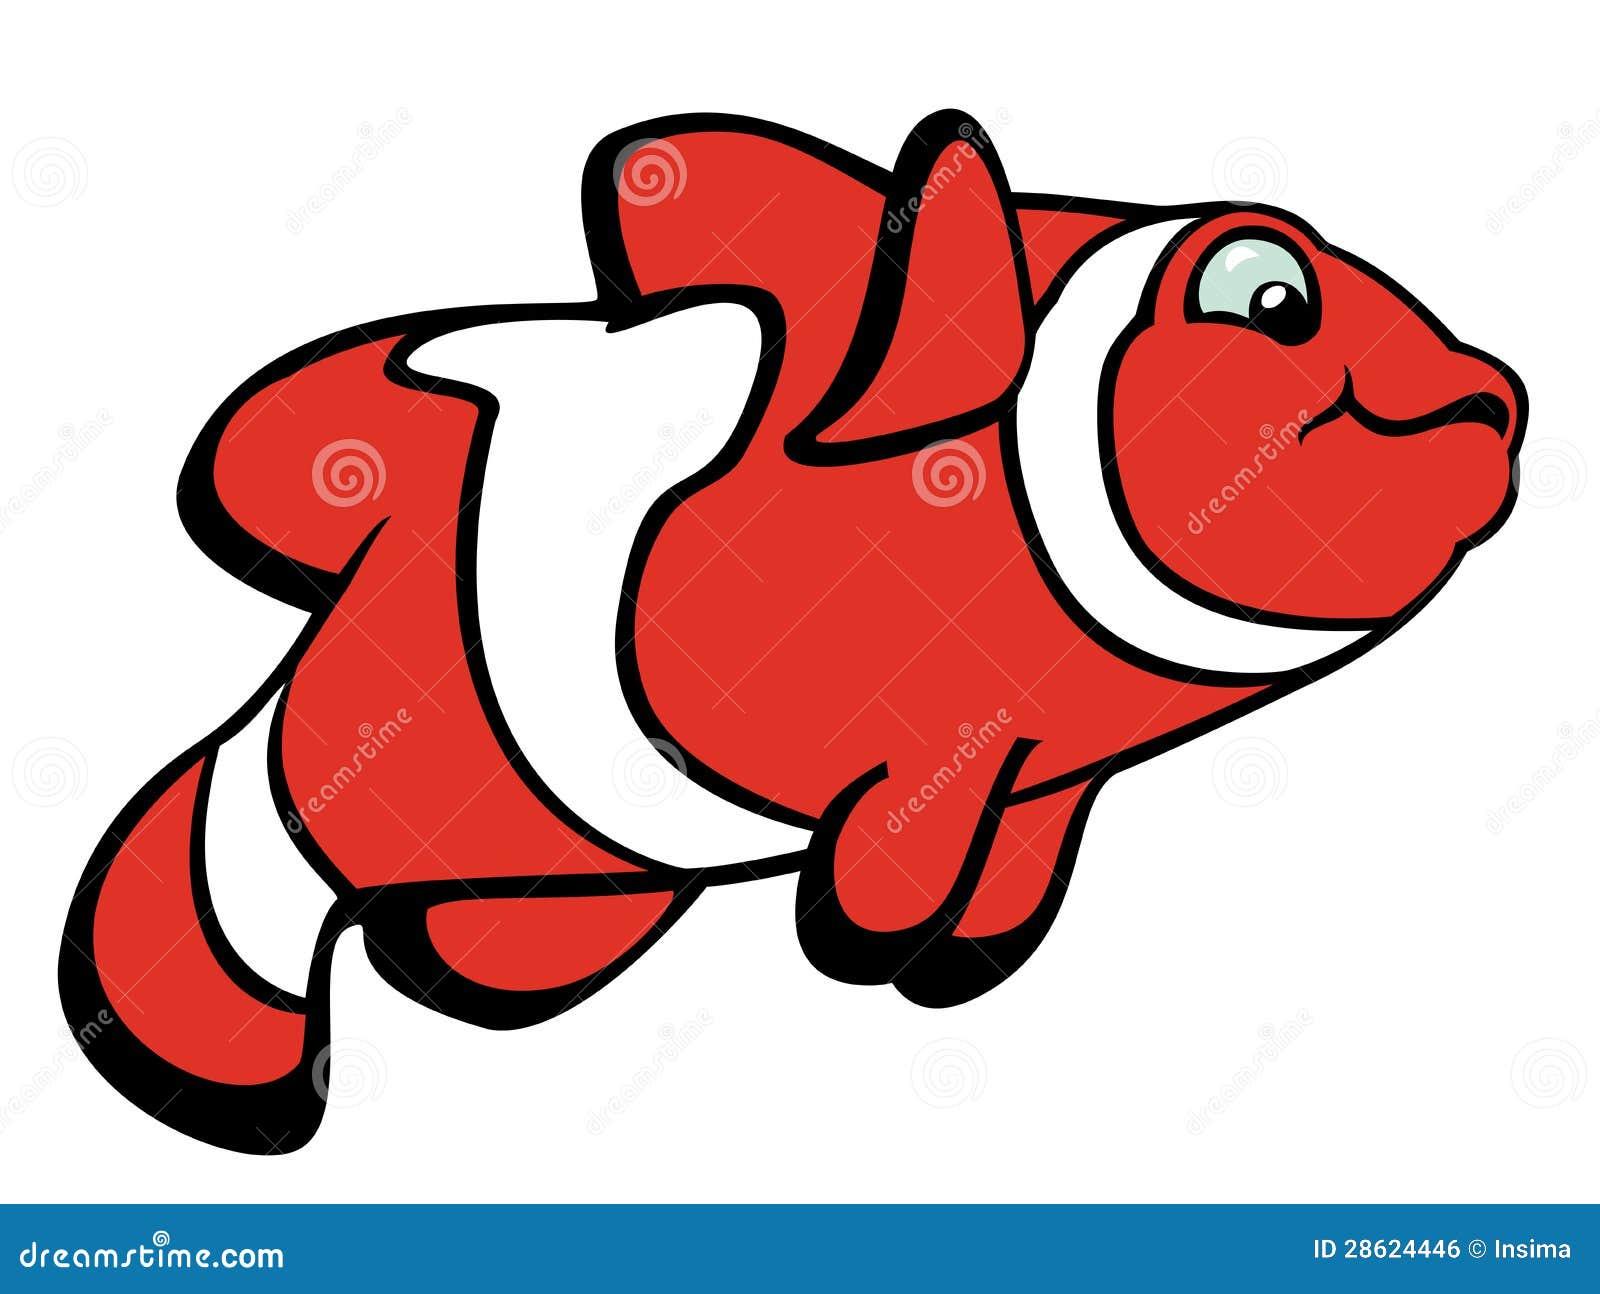 Clownfish Stock Illustrations – 948 Clownfish Stock Illustrations ...